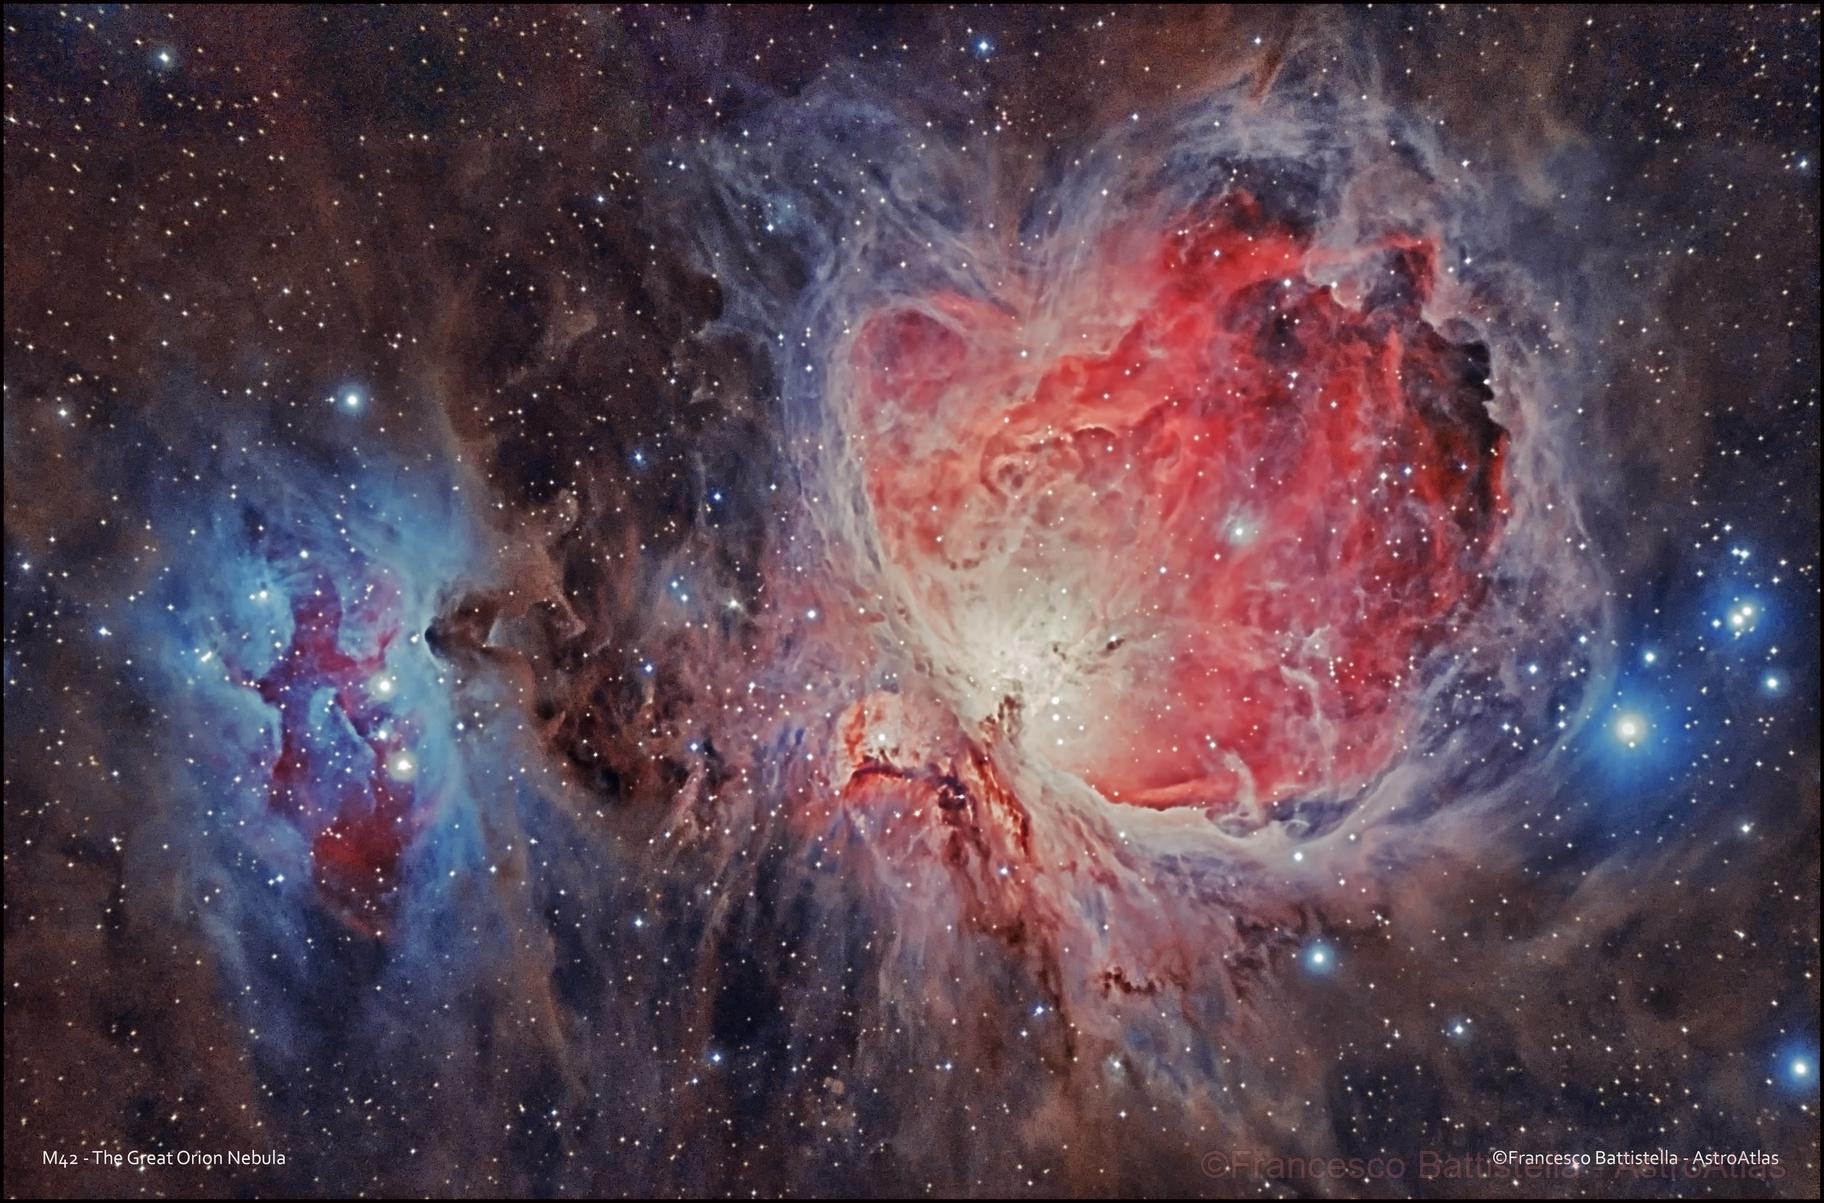 APOD: 2017 November 29 - M42: The Great Orion Nebula